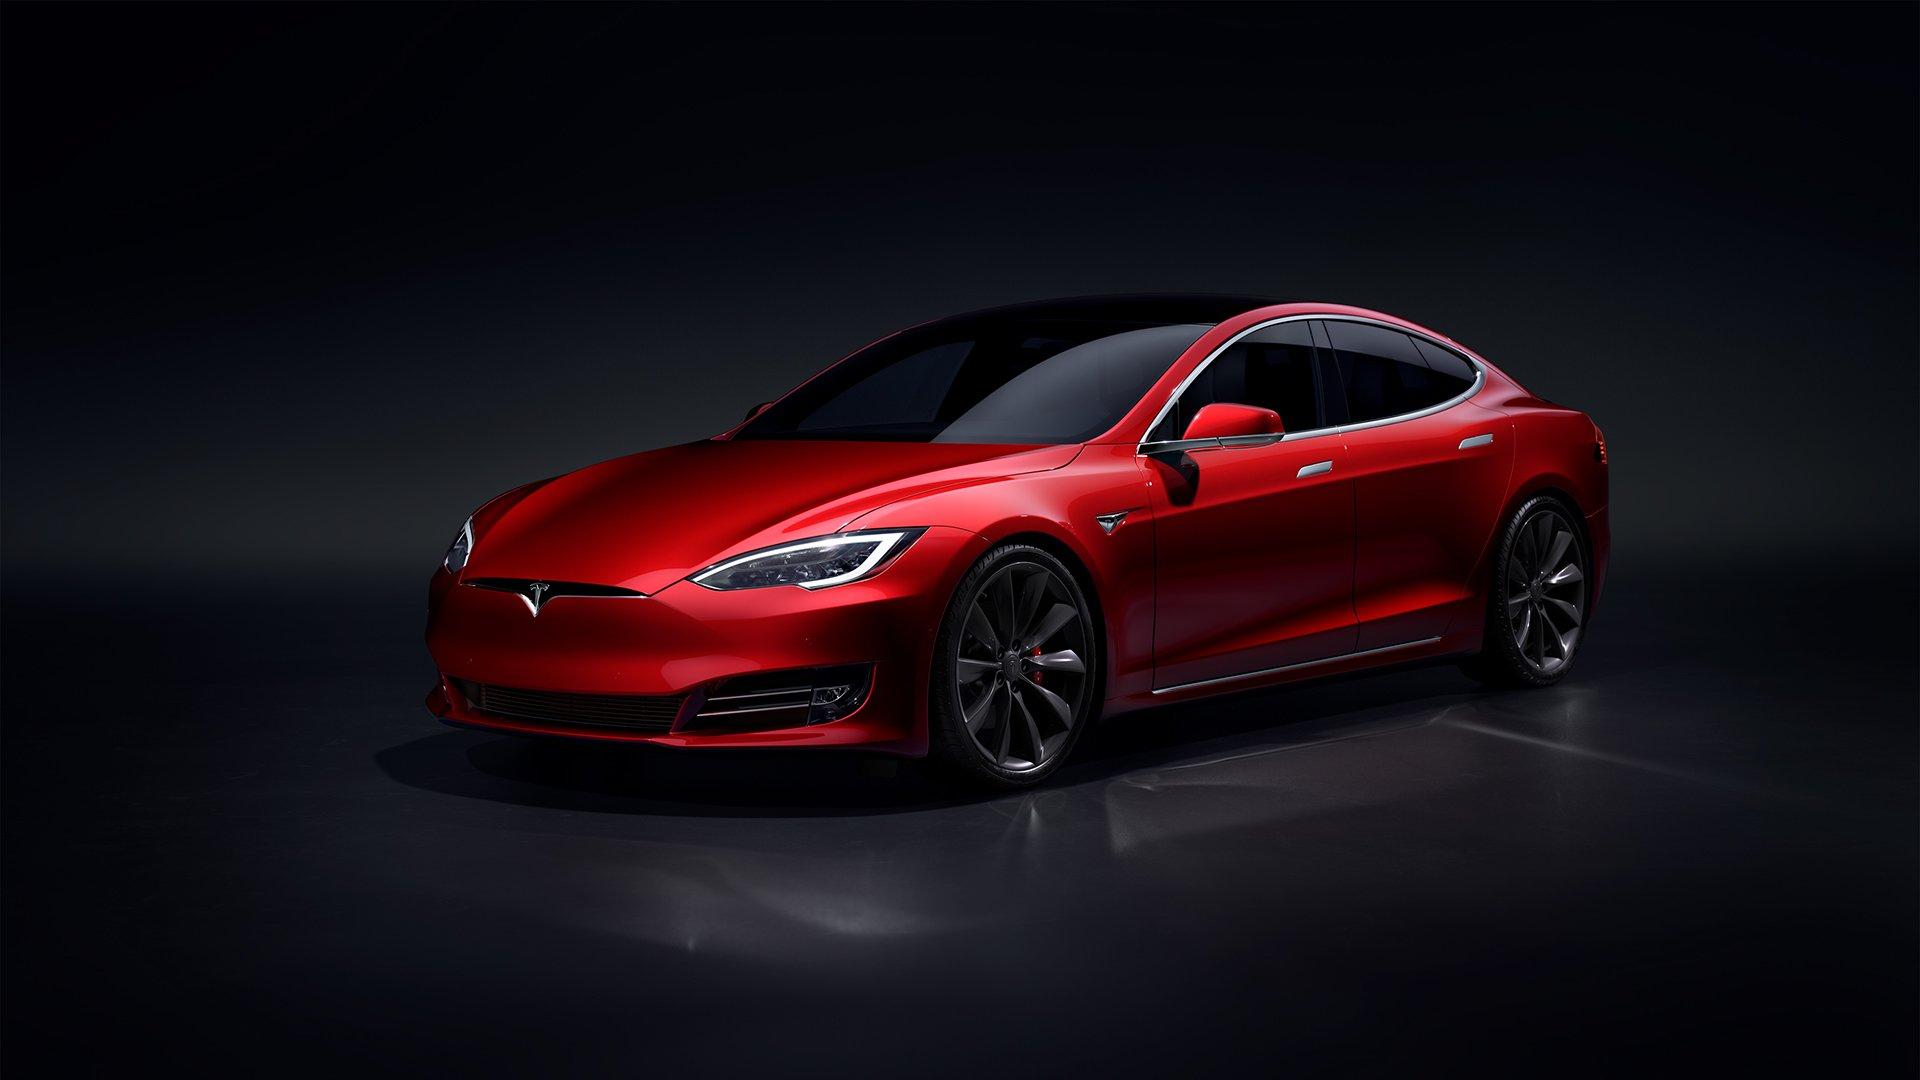 Tesla full wallpaper